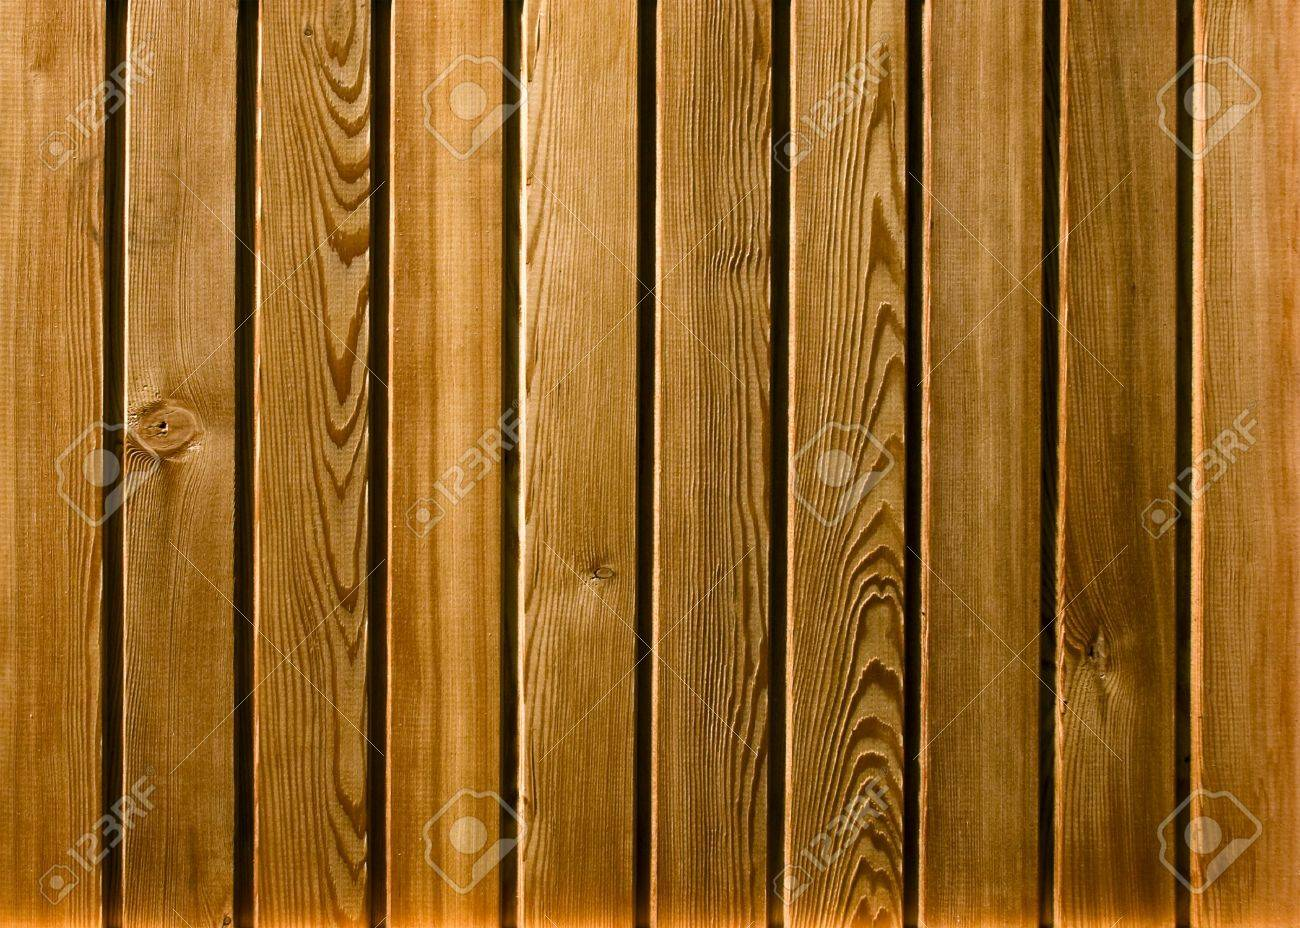 Vertical Wooden Background